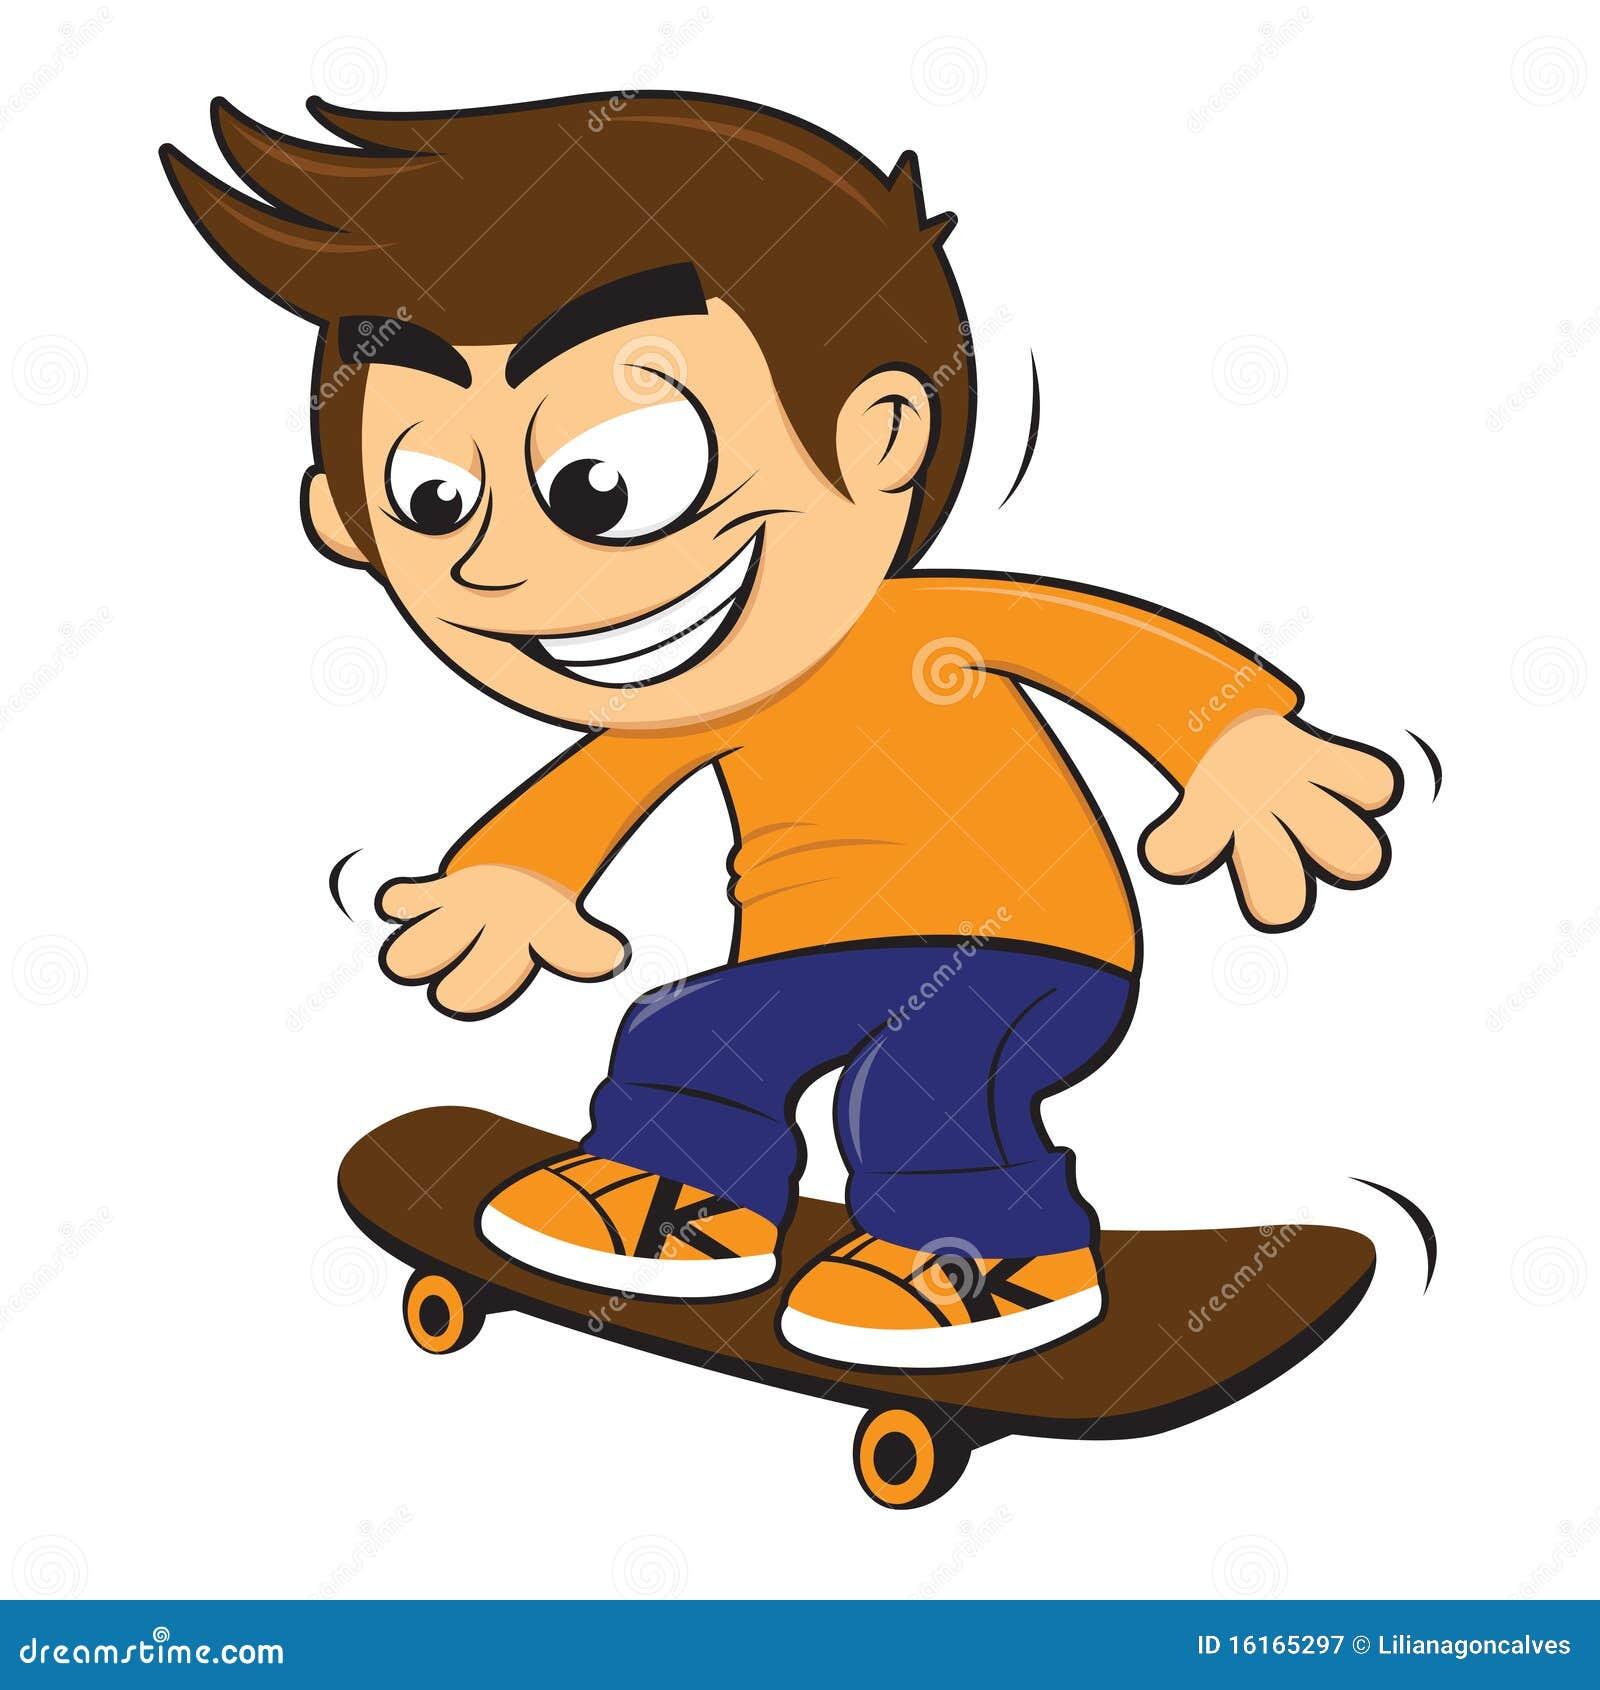 Boy Riding Skateboard Clipart